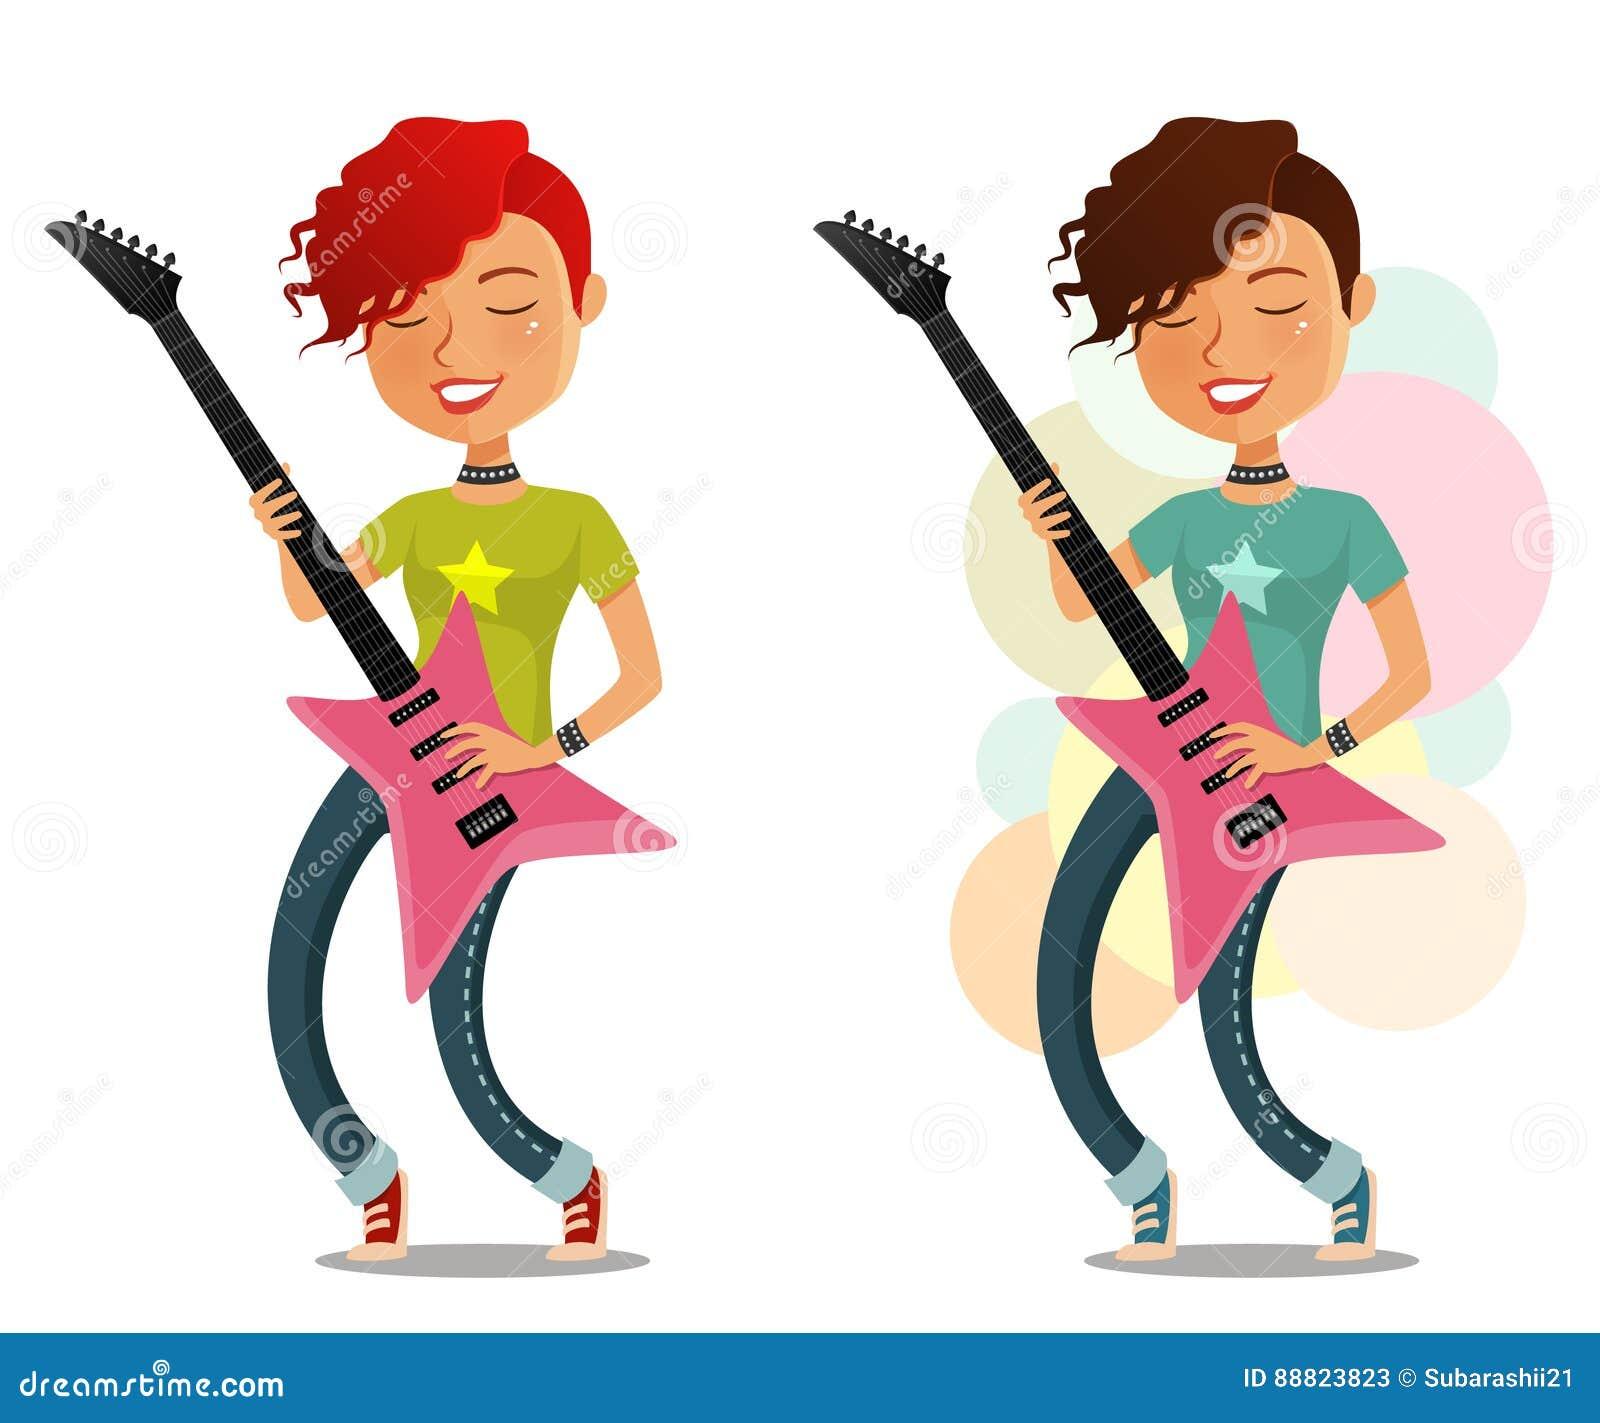 Funny Cartoon Girl Playing Guitar Stock Vector Art & More ...  Cartoon Girl Guitarist